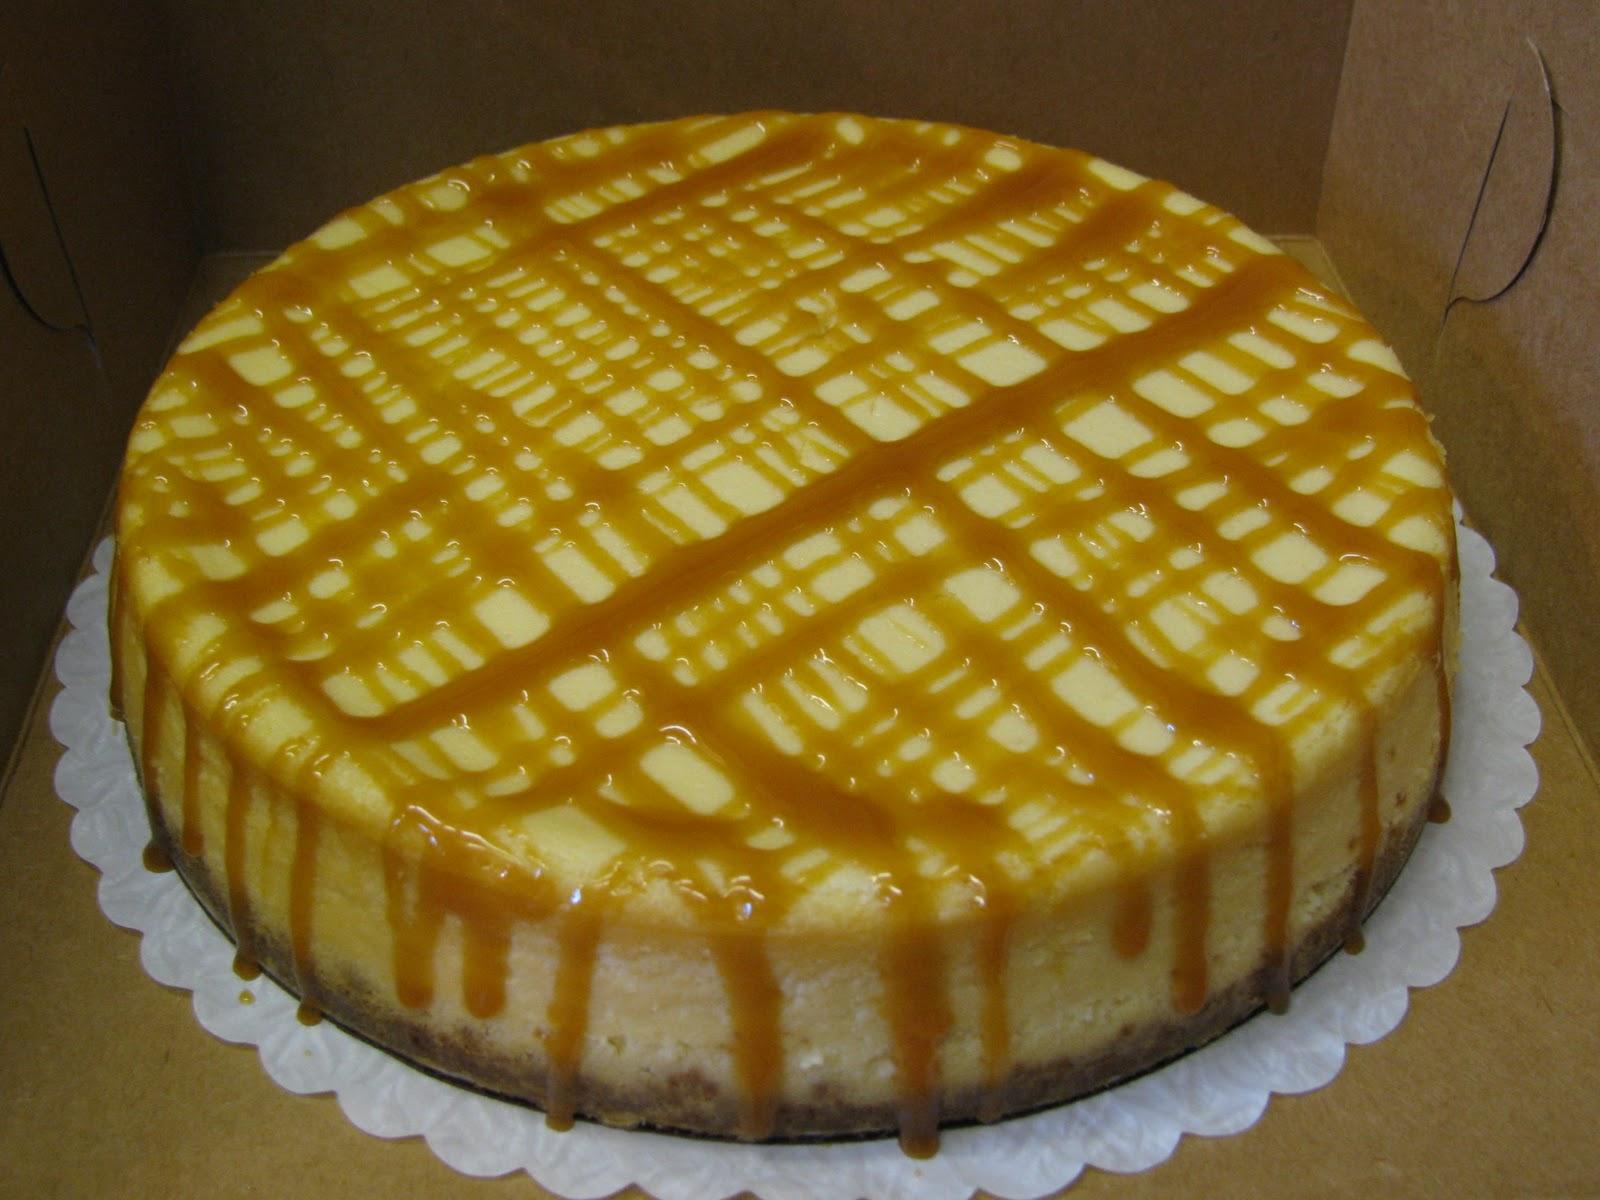 10-16-10+-+Caramel+Macchiato+Cheesecake.jpg